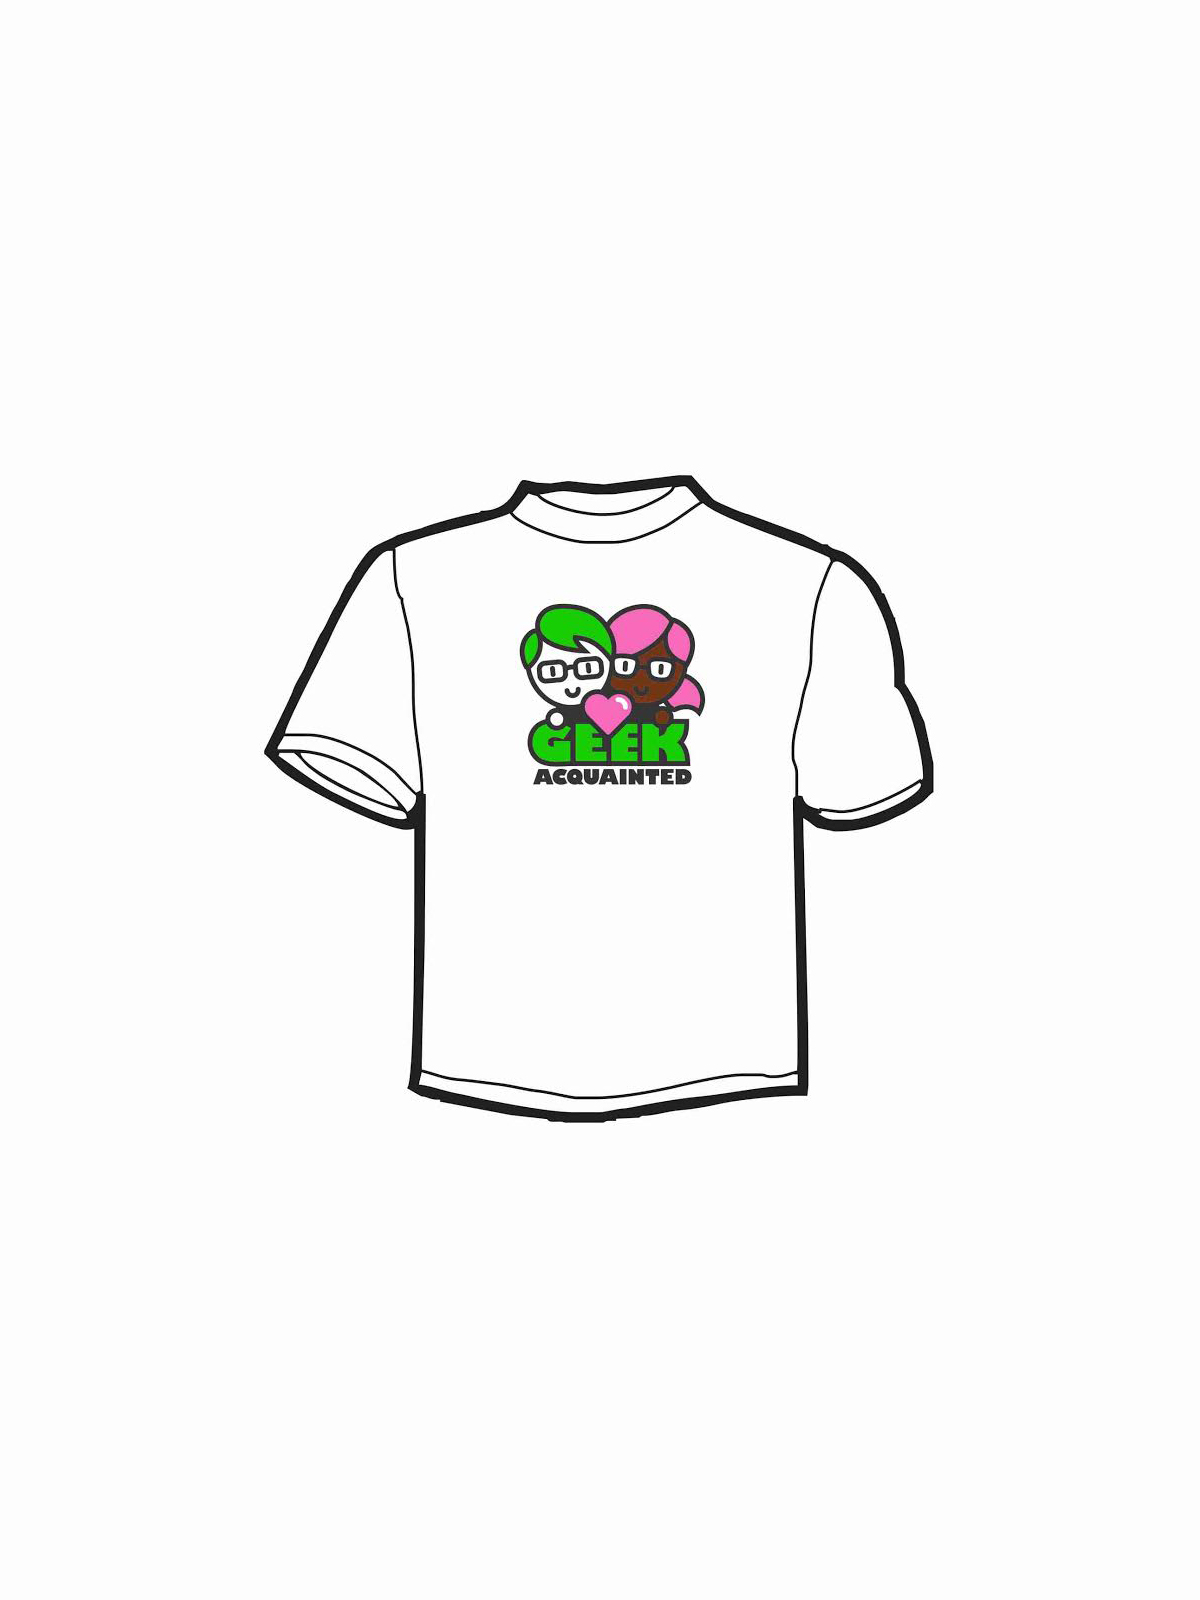 Geek Acquainted Shirt